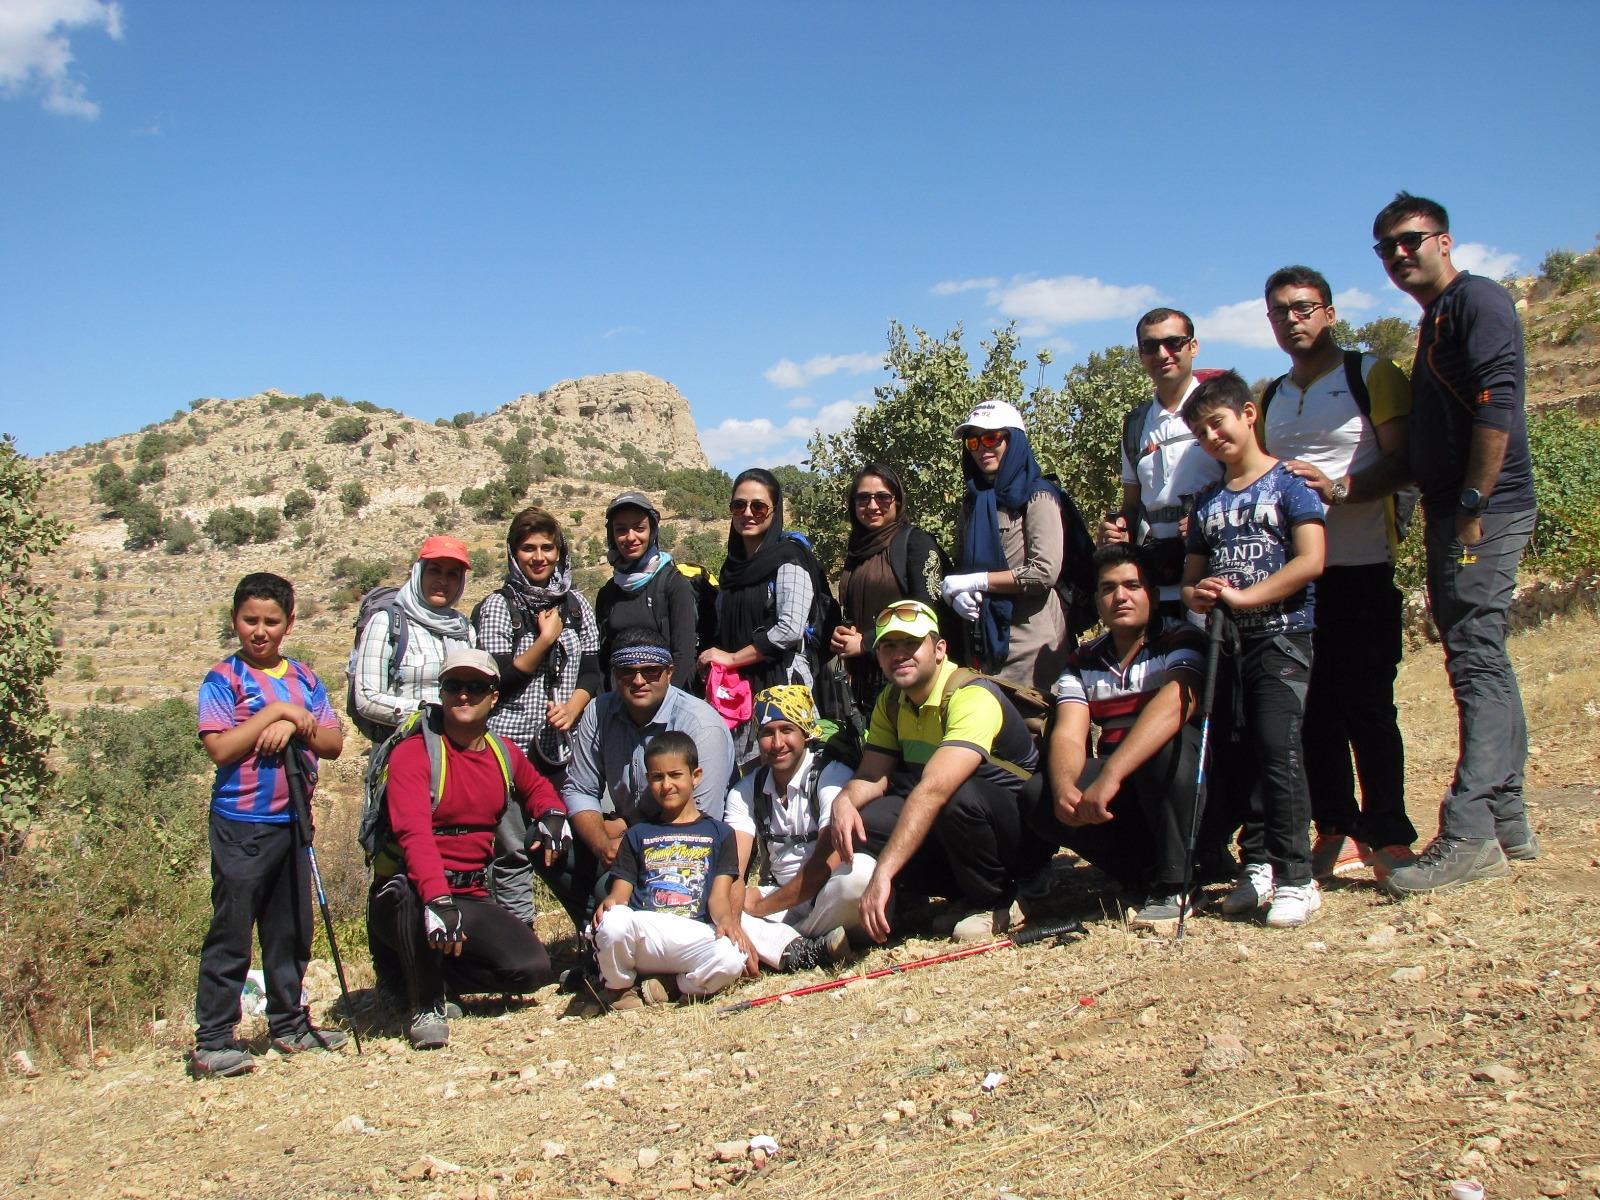 صعود به کوه دوان